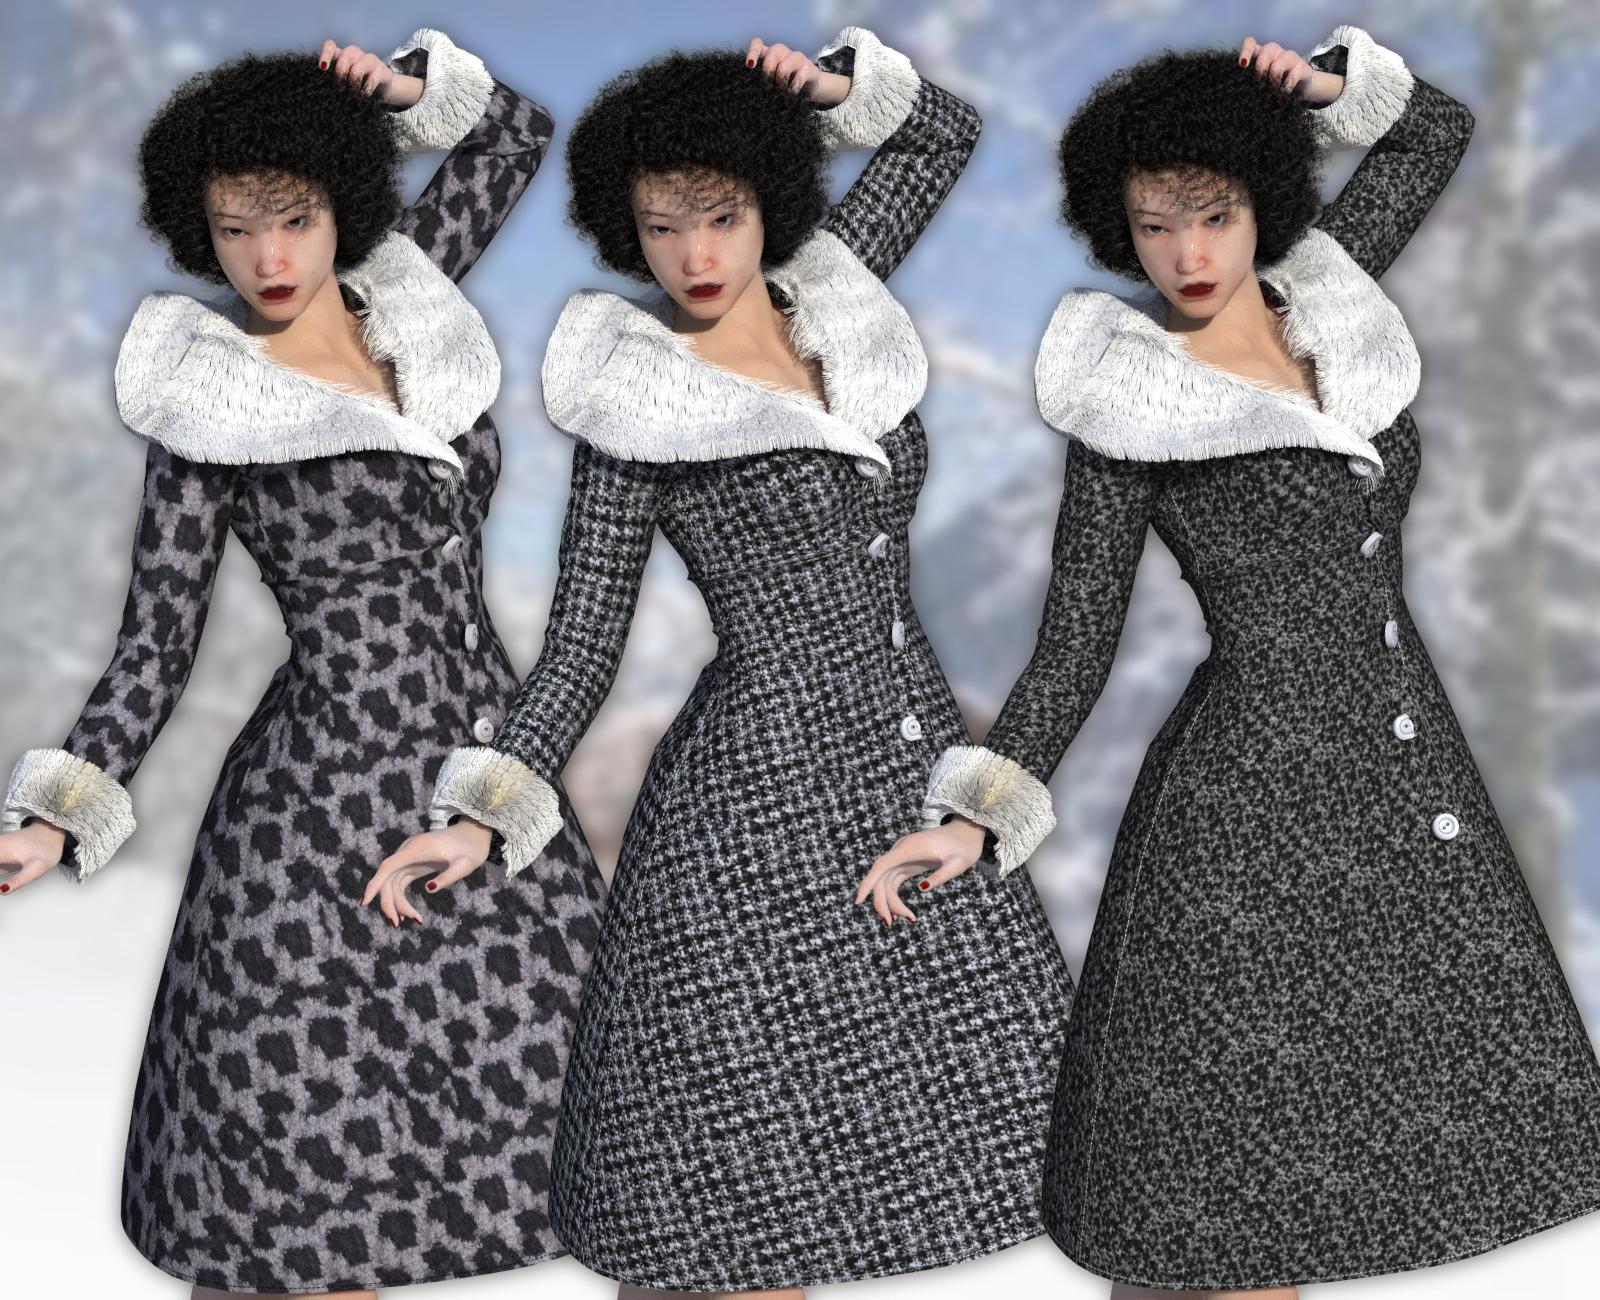 Wintercoat promo5